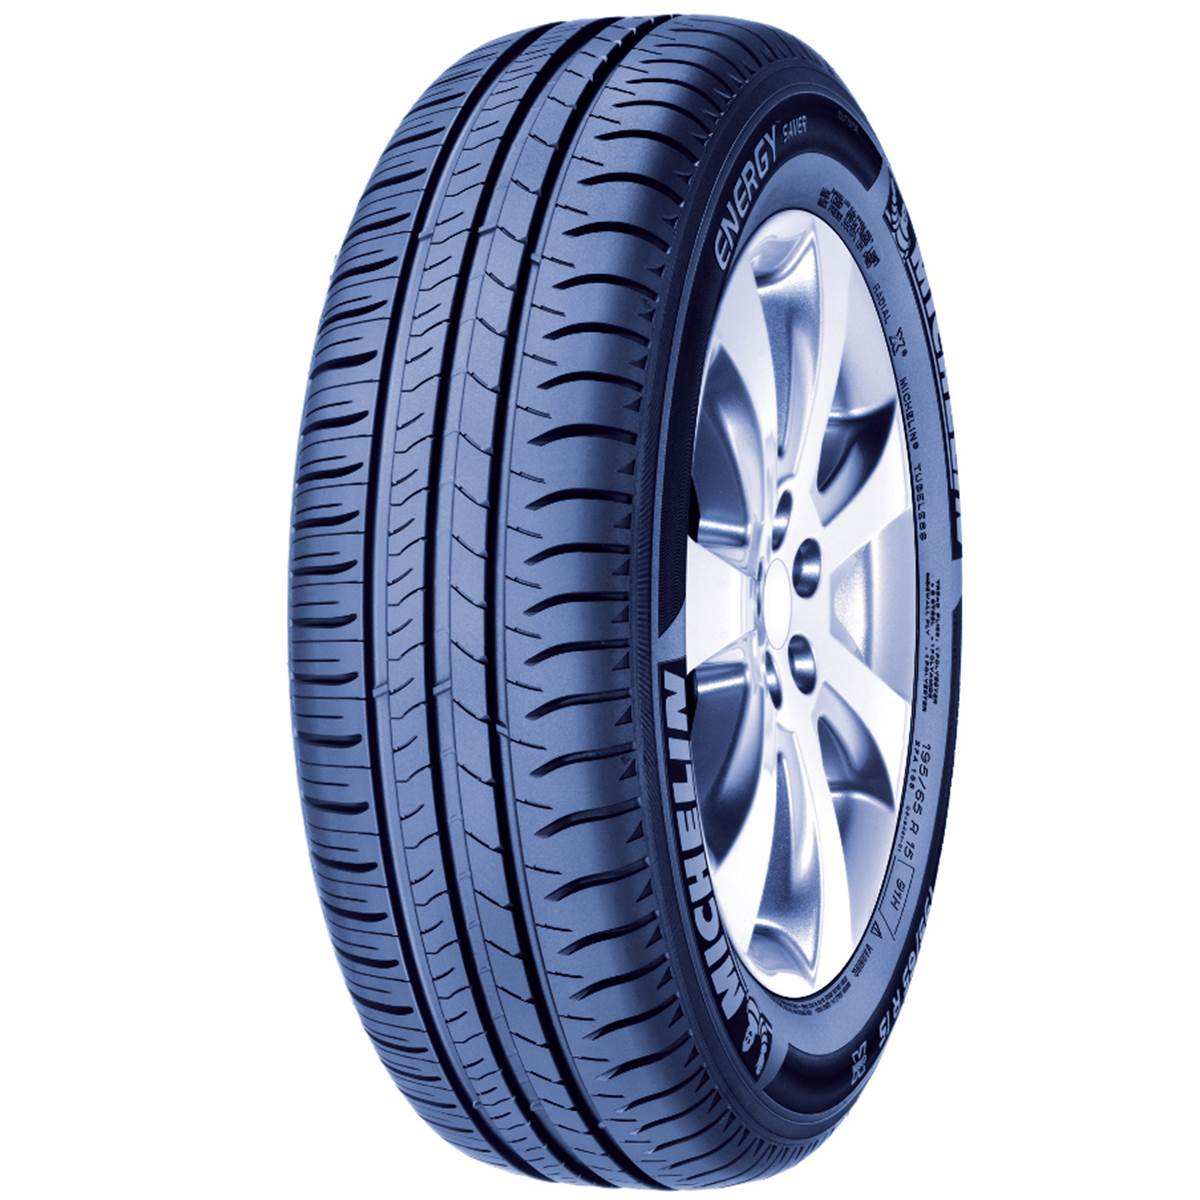 Pneu Michelin 185/65R15 88H Energy Saver